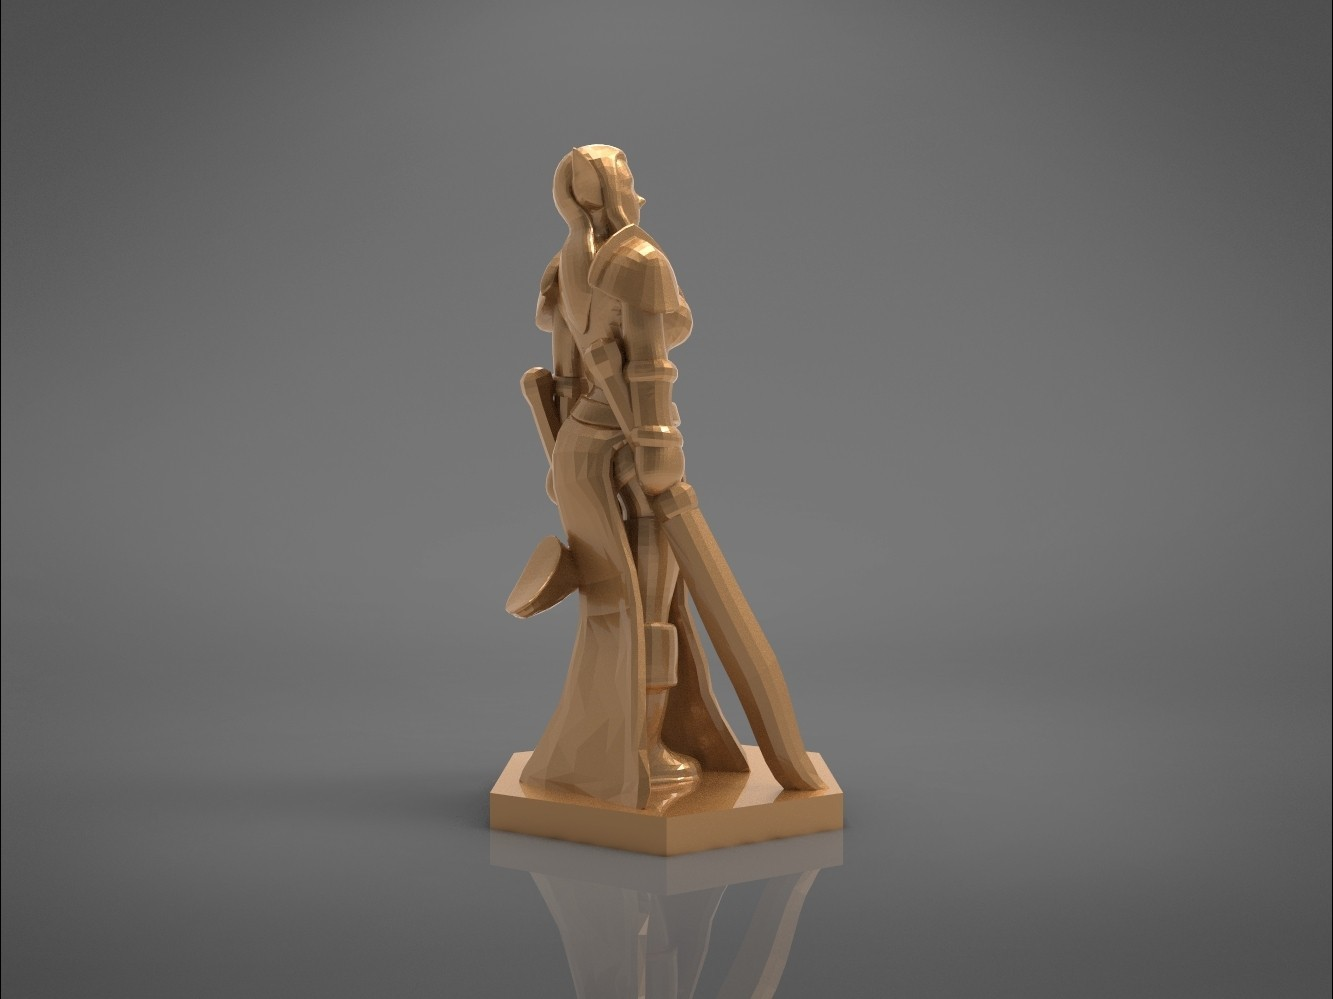 Warrior_2-left_perspective.319.jpg Download STL file ELF WARRIOR FEMALE CHARACTER GAME FIGURE 3D print model • 3D printing object, 3D-mon